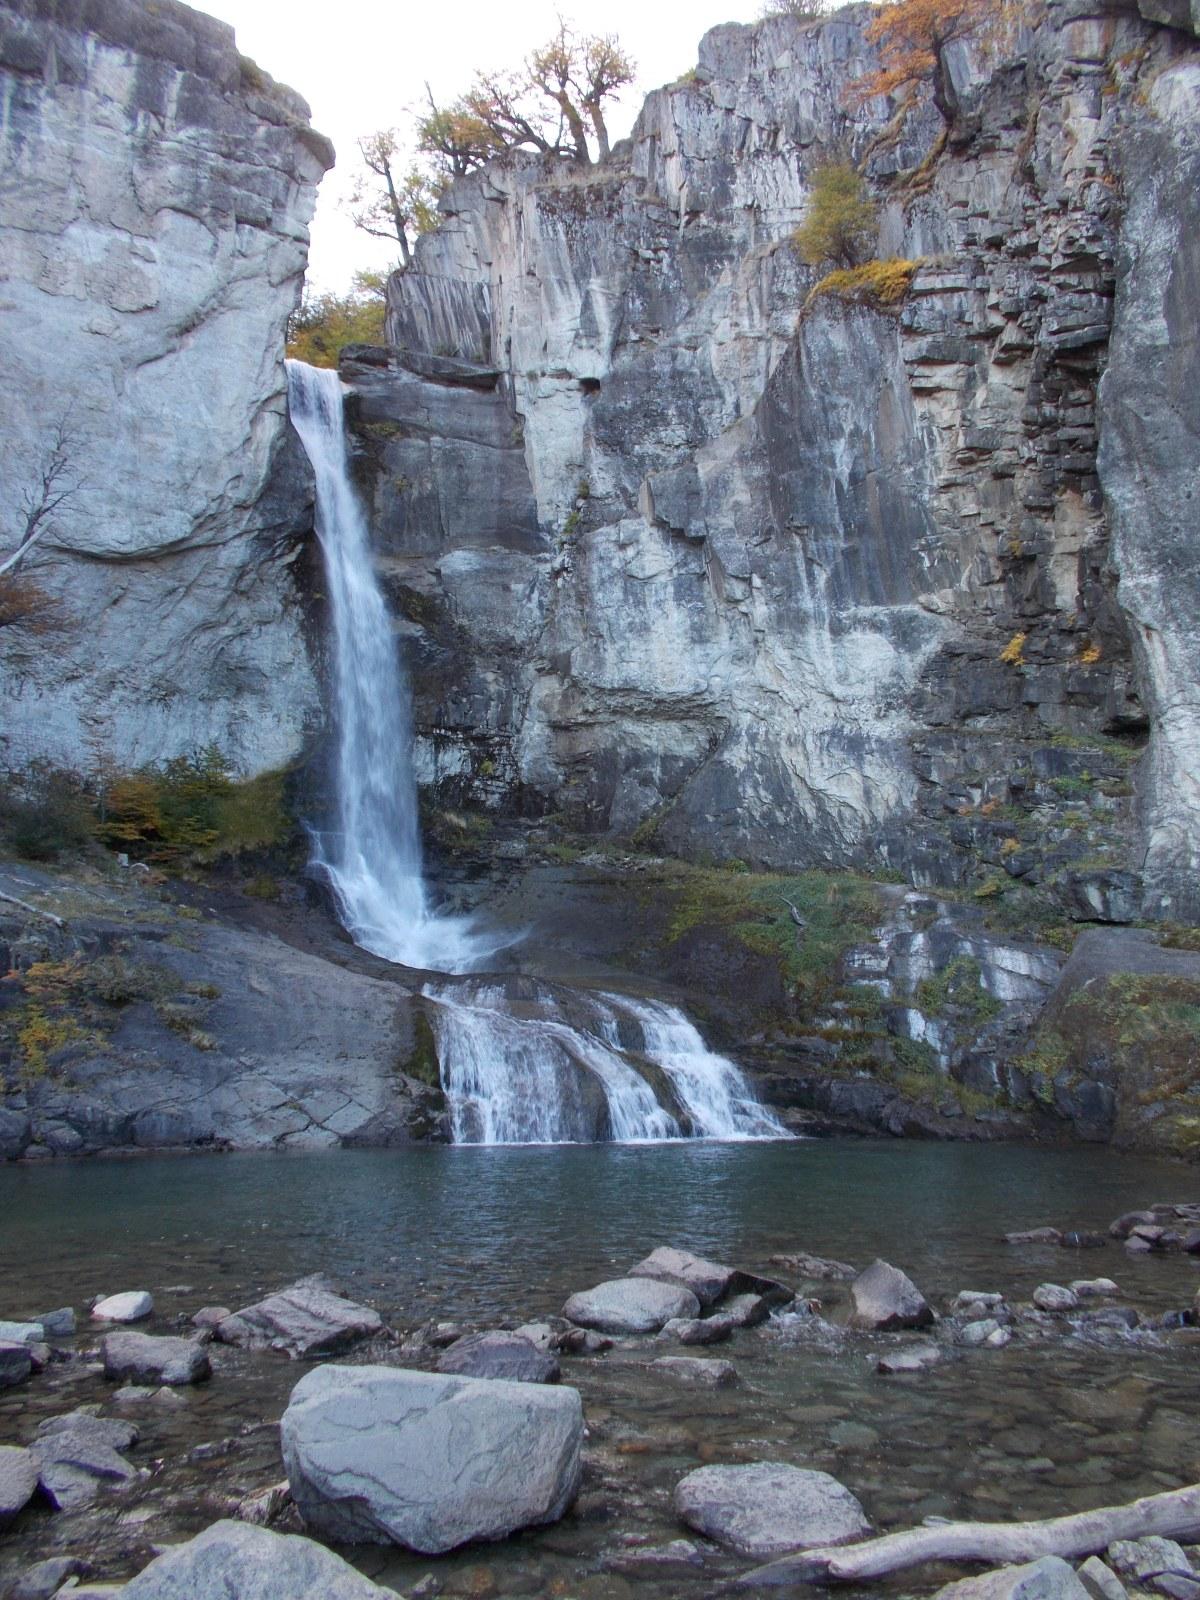 Chorillo del Salto waterfall, just outside El Chalten